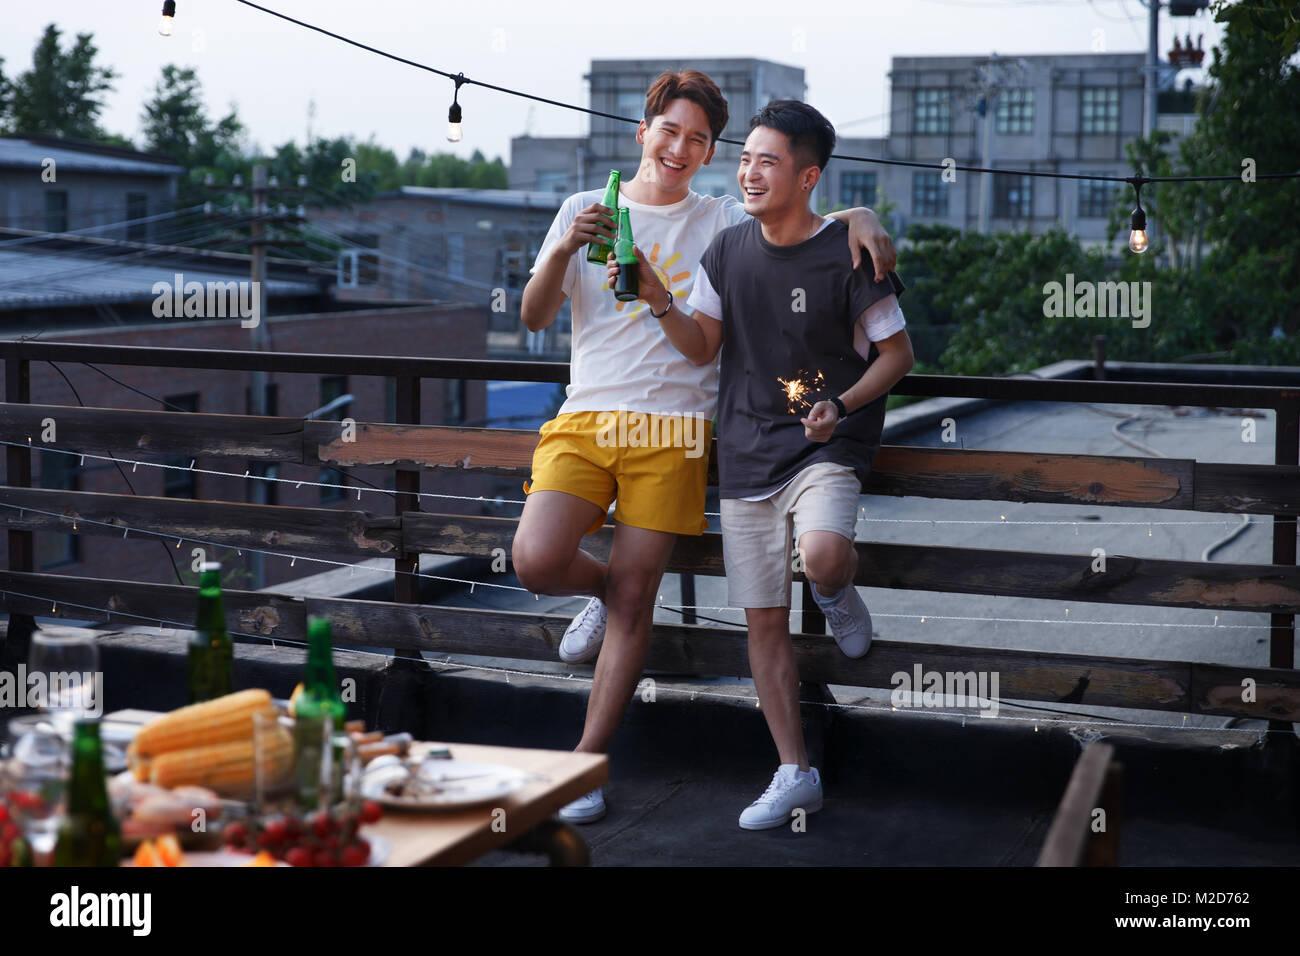 Zwei junge Männer tranken Bier Stockbild